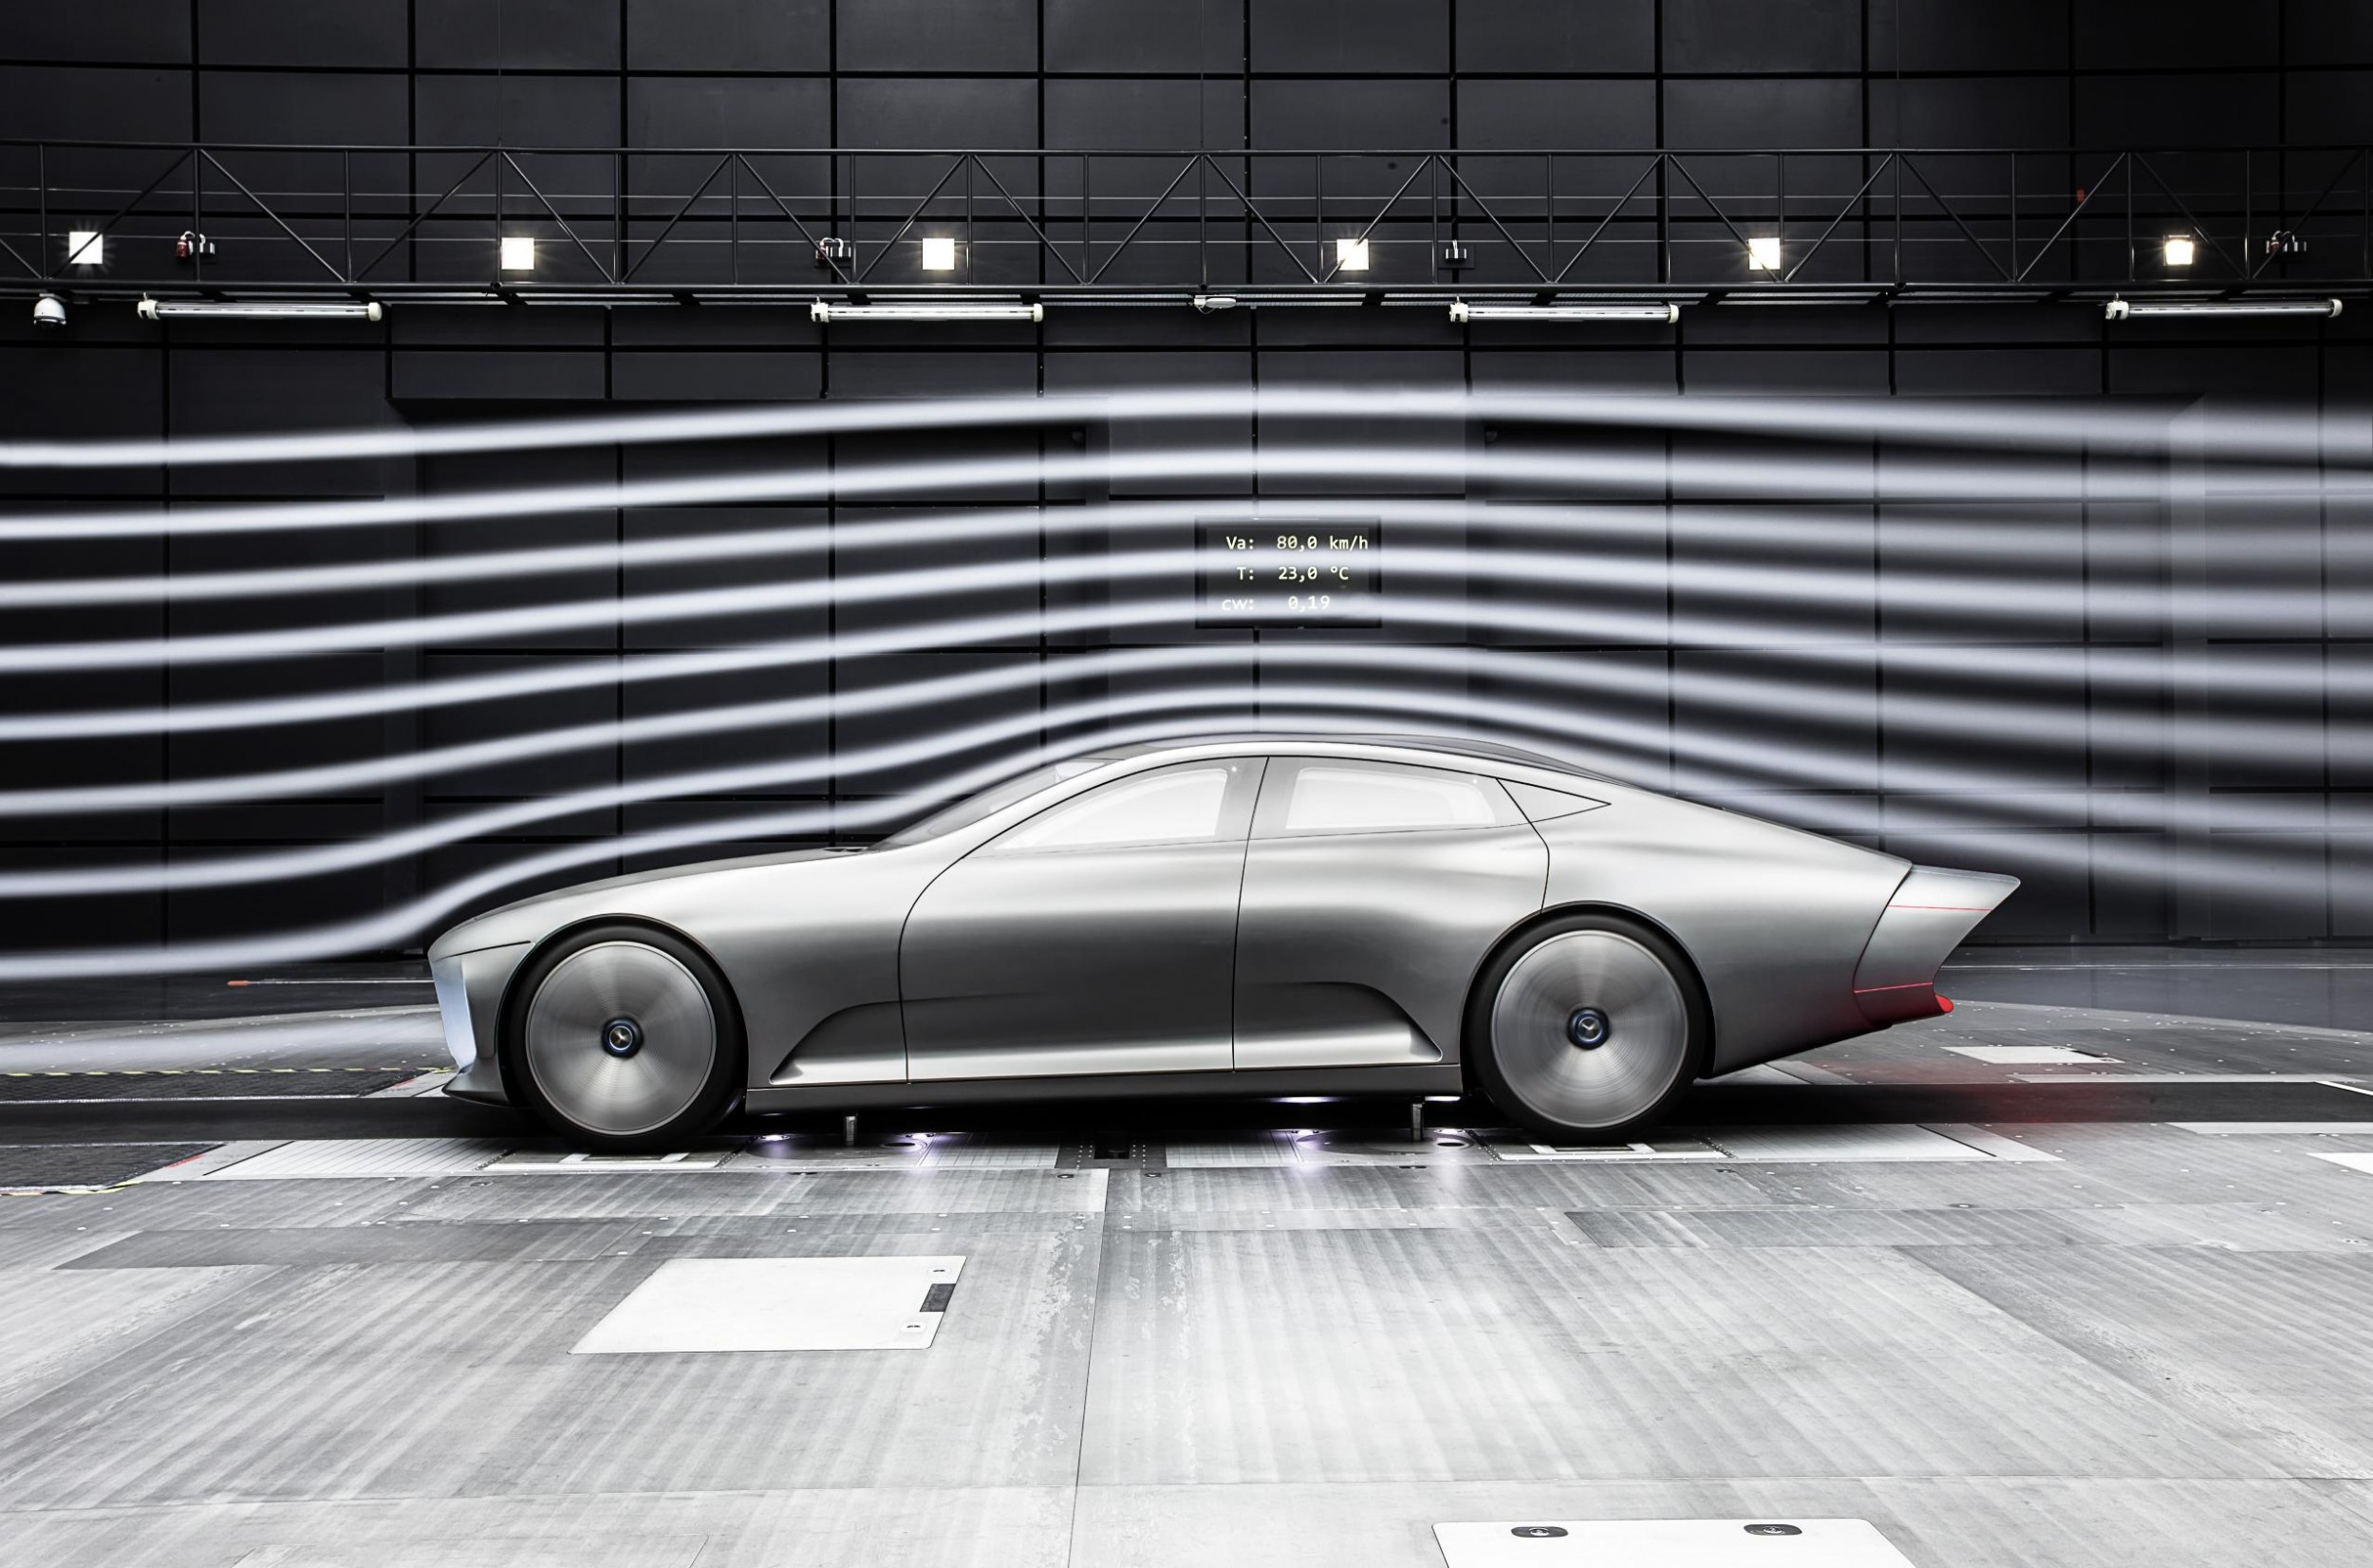 https://www.autotalk.com/wp-content/uploads/2015/09/2015-Mercedes-Benz-Concept-IAA-9.jpg